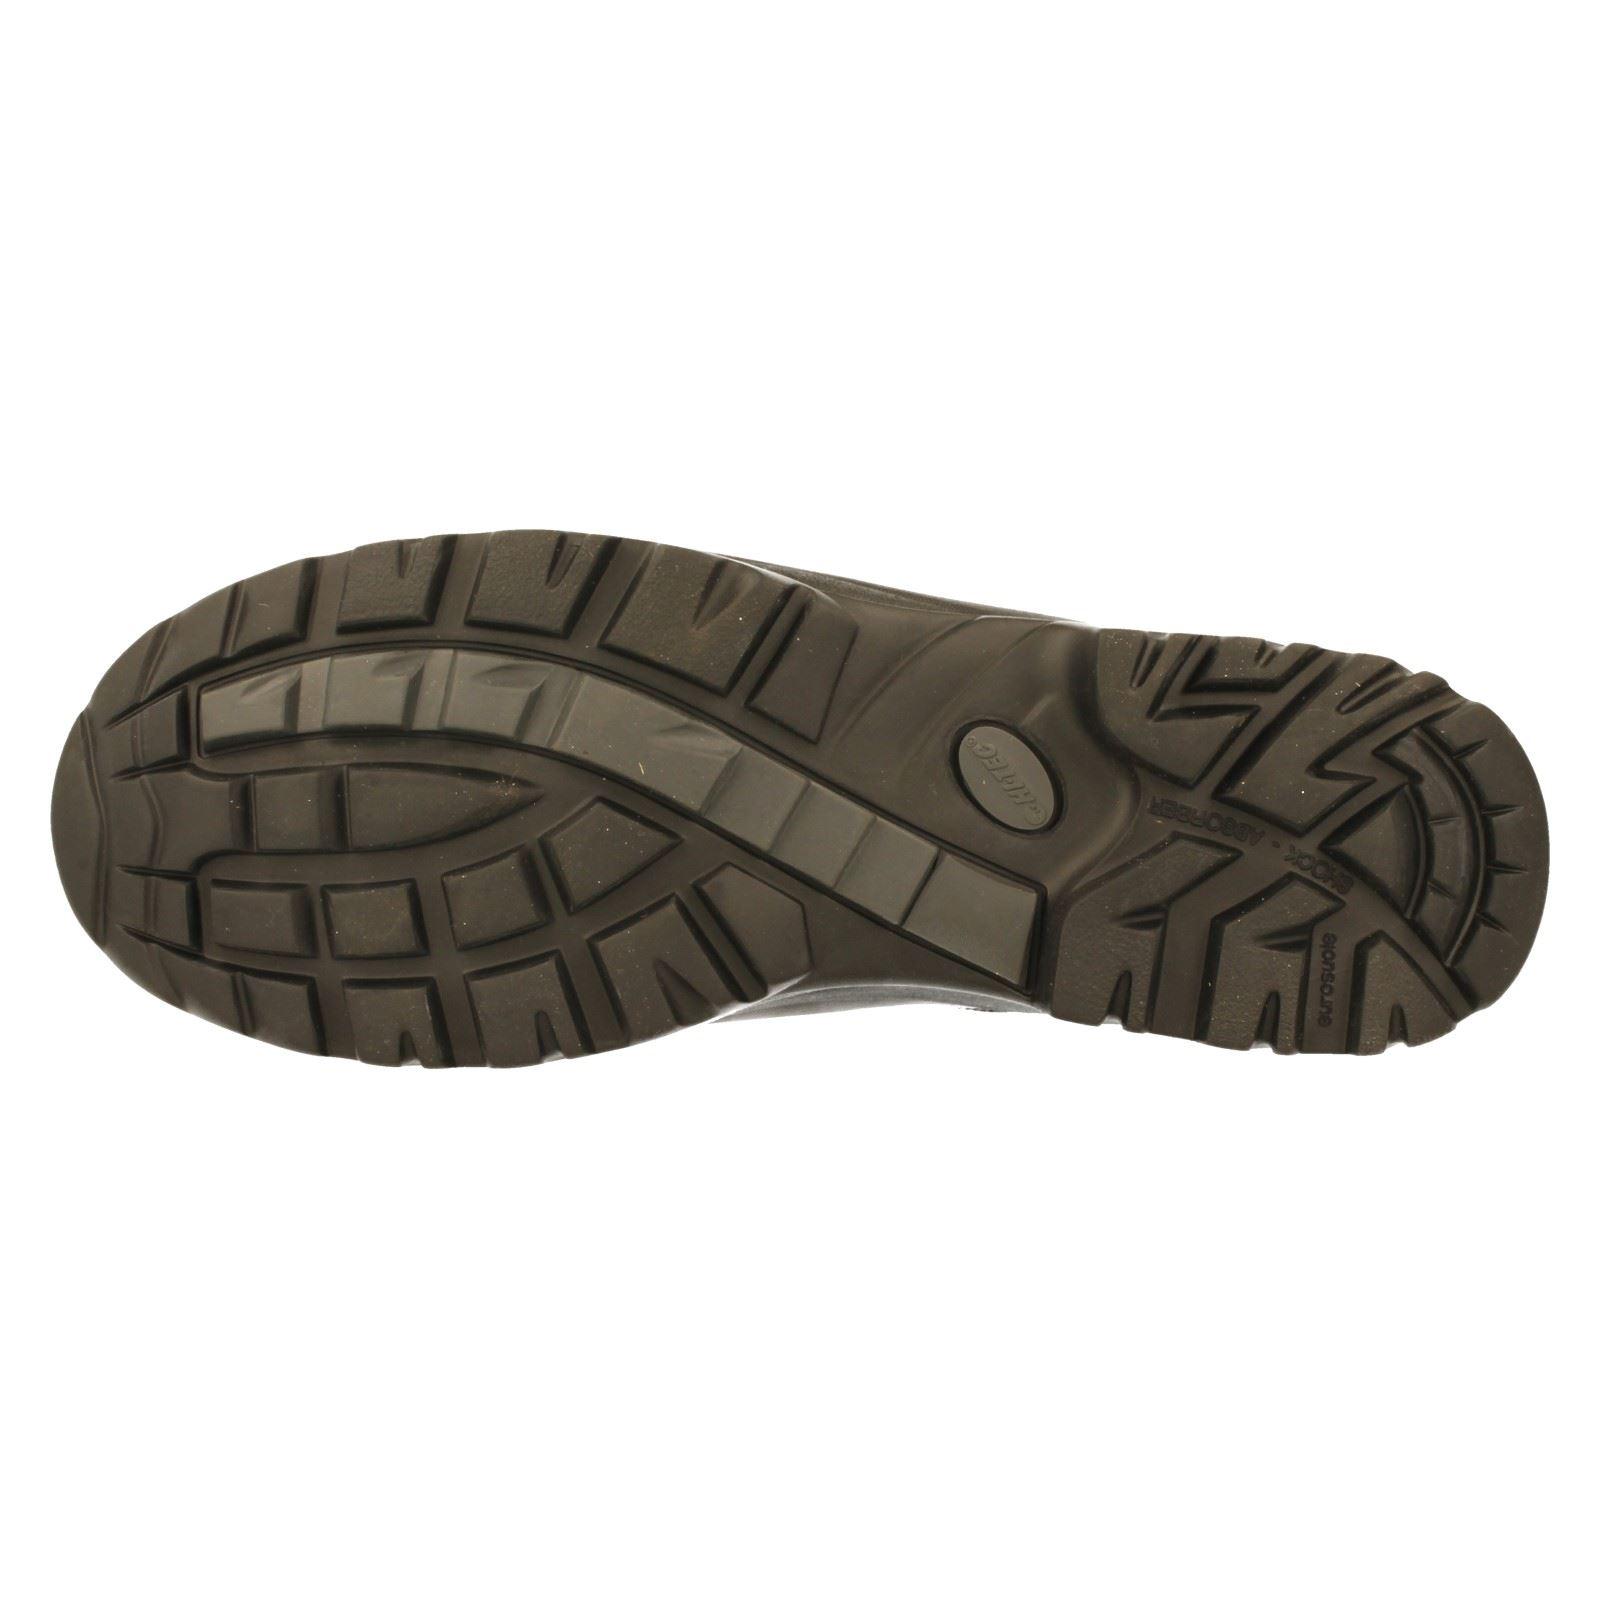 Mens Hi-Tec Waterprrof Walking Stiefel Label Ravine -W